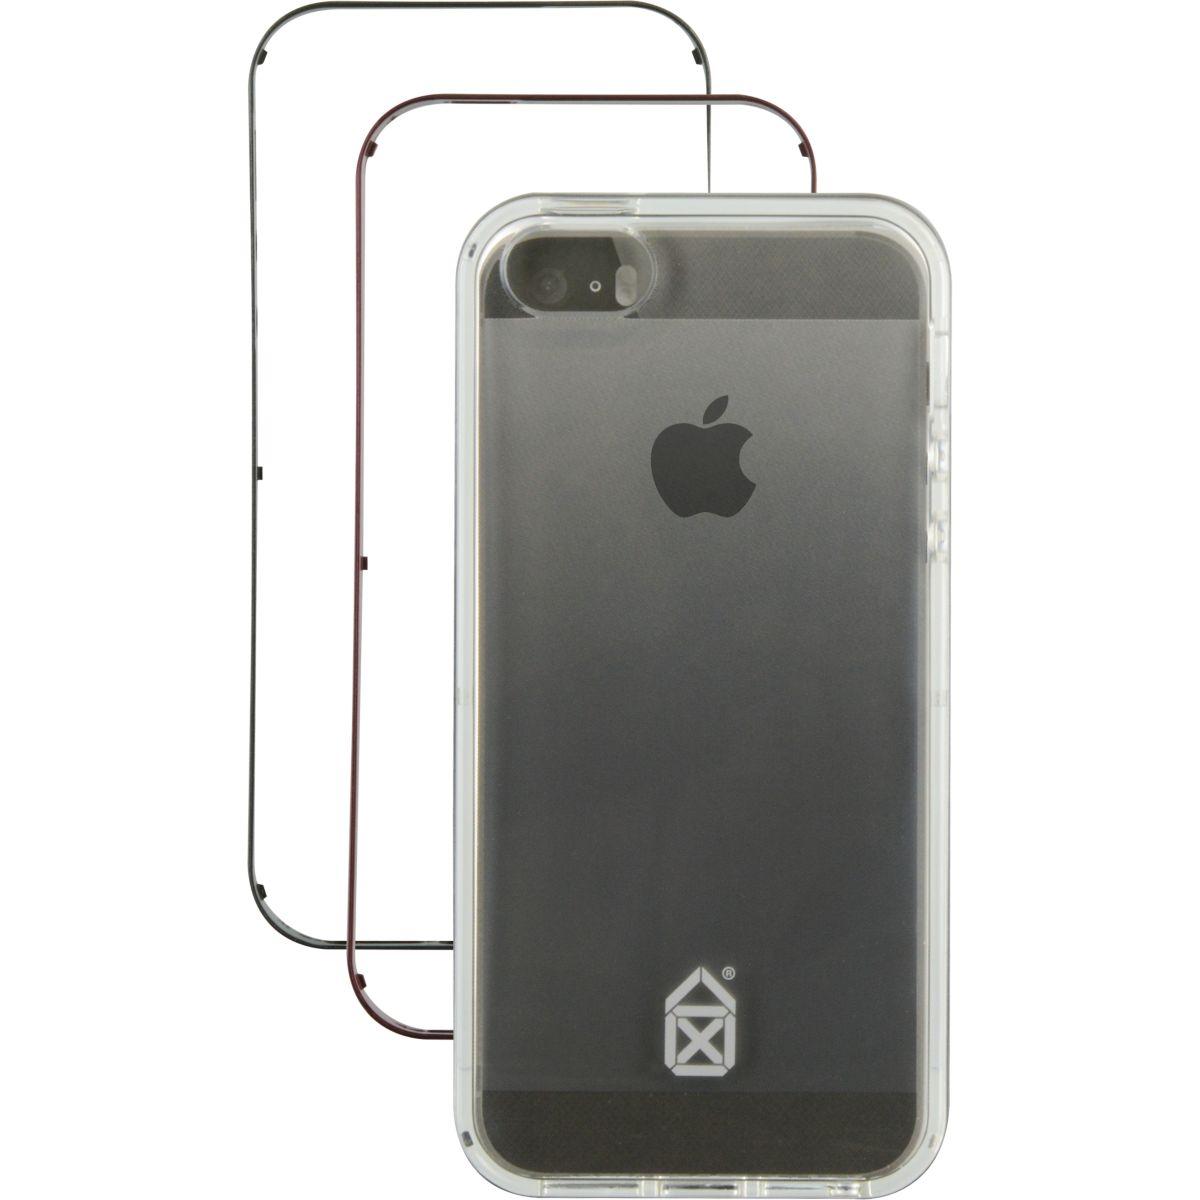 Bumper CASE SCENARIO 3 en 1 gris sidéral iPhone 5S/SE (photo)